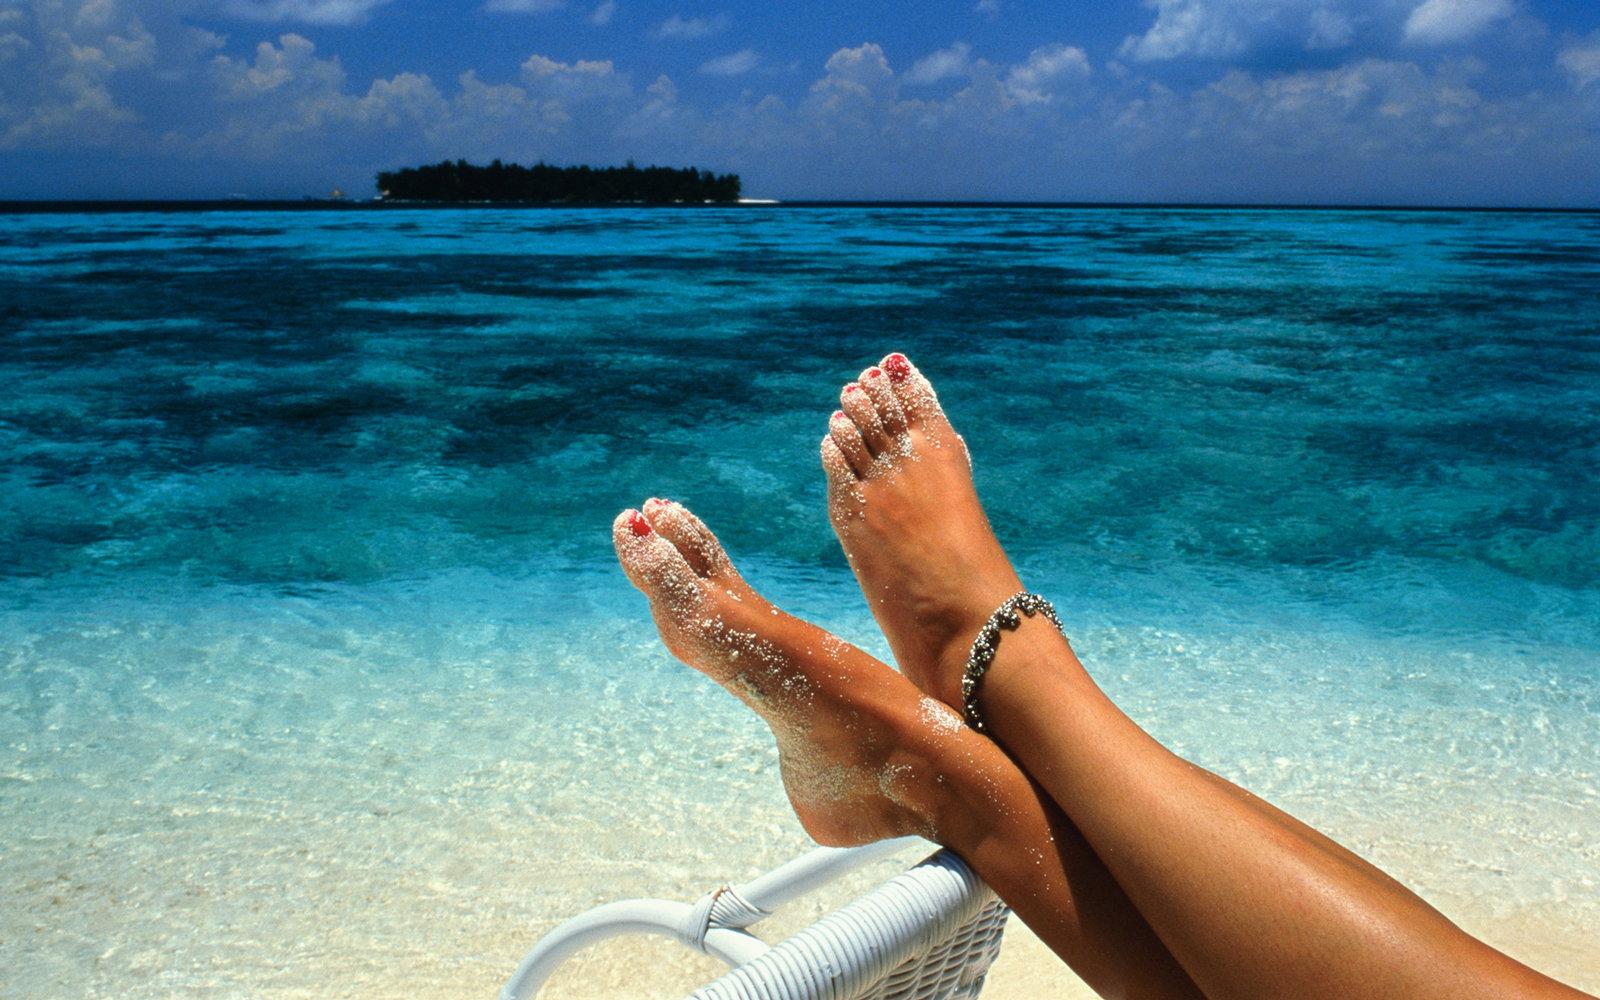 feet-maldives-BUDGET0517.jpg